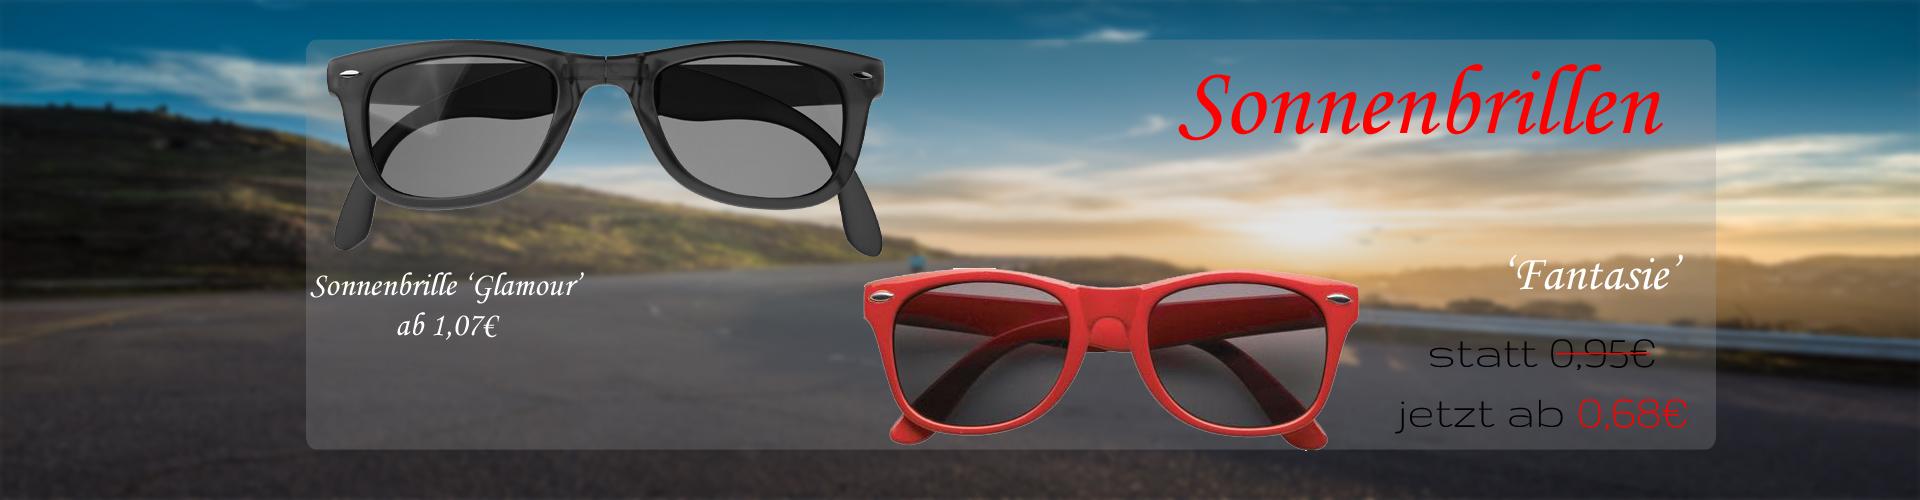 Sonnenbrillen bei BizTune